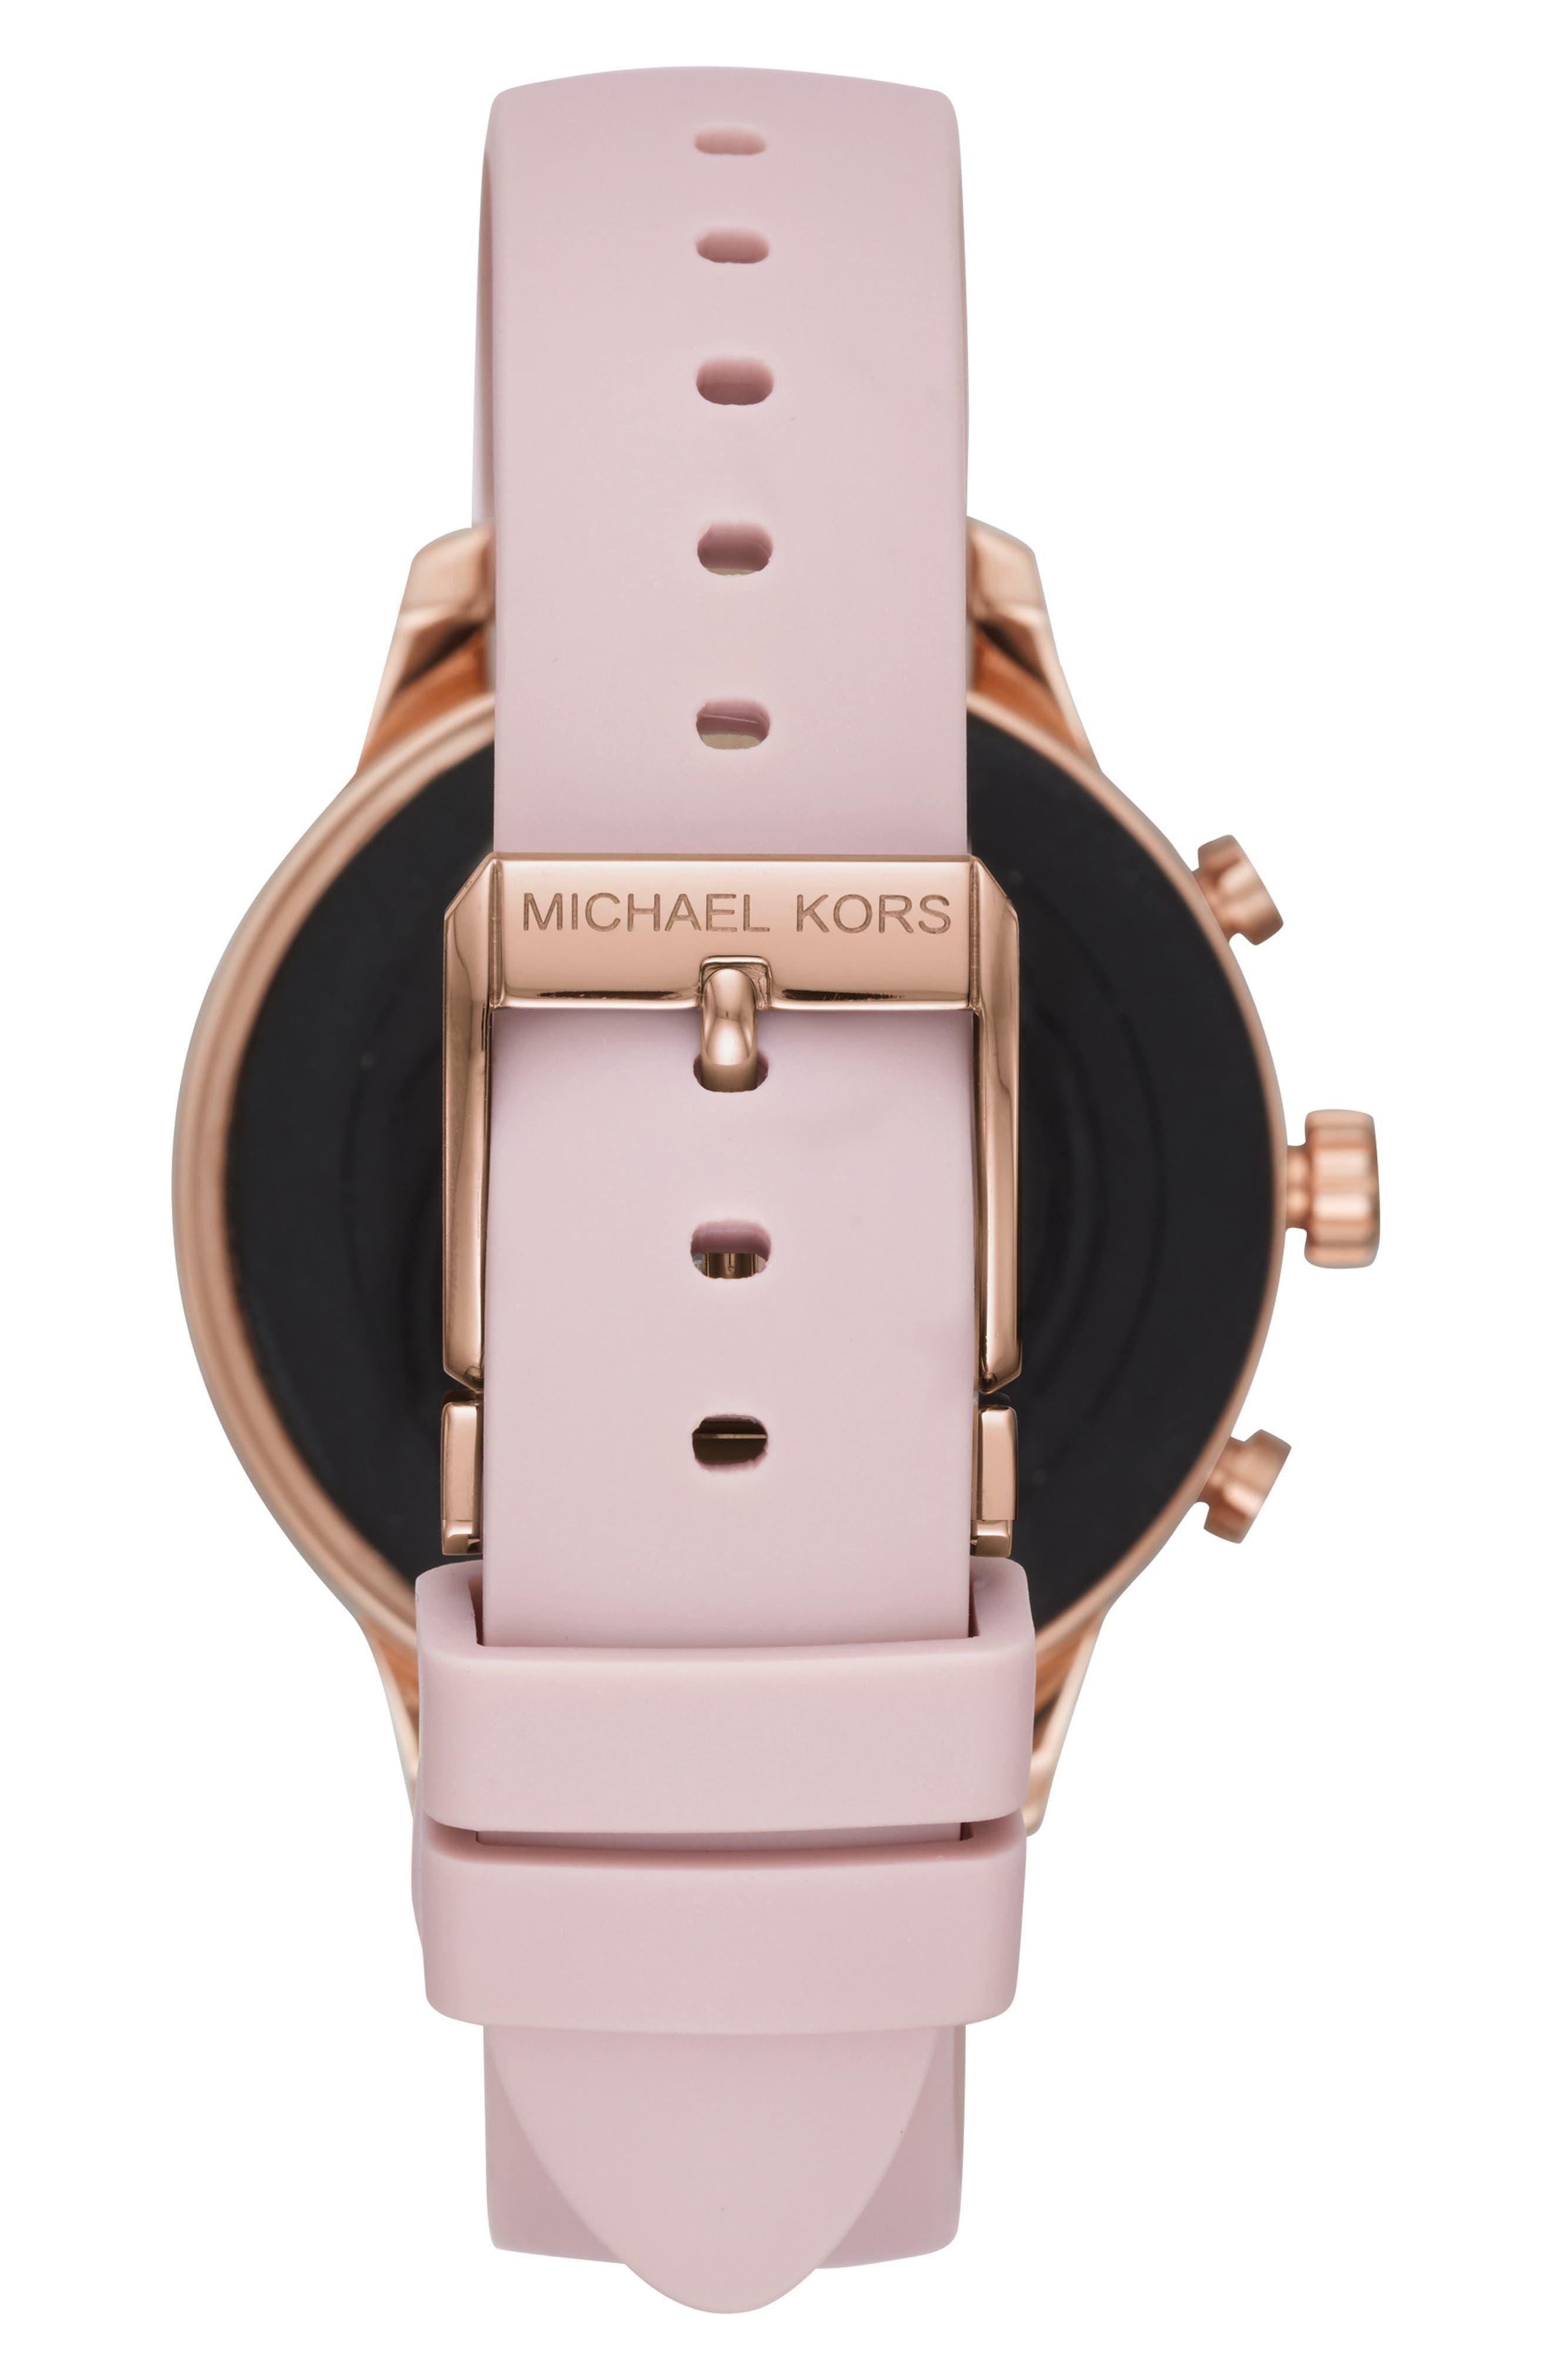 MICHAEL KORS,                             MICHAEL Michael Kors Access Runway Smart Watch, 41mm,                             Alternate thumbnail 2, color,                             PINK/ ROSE GOLD